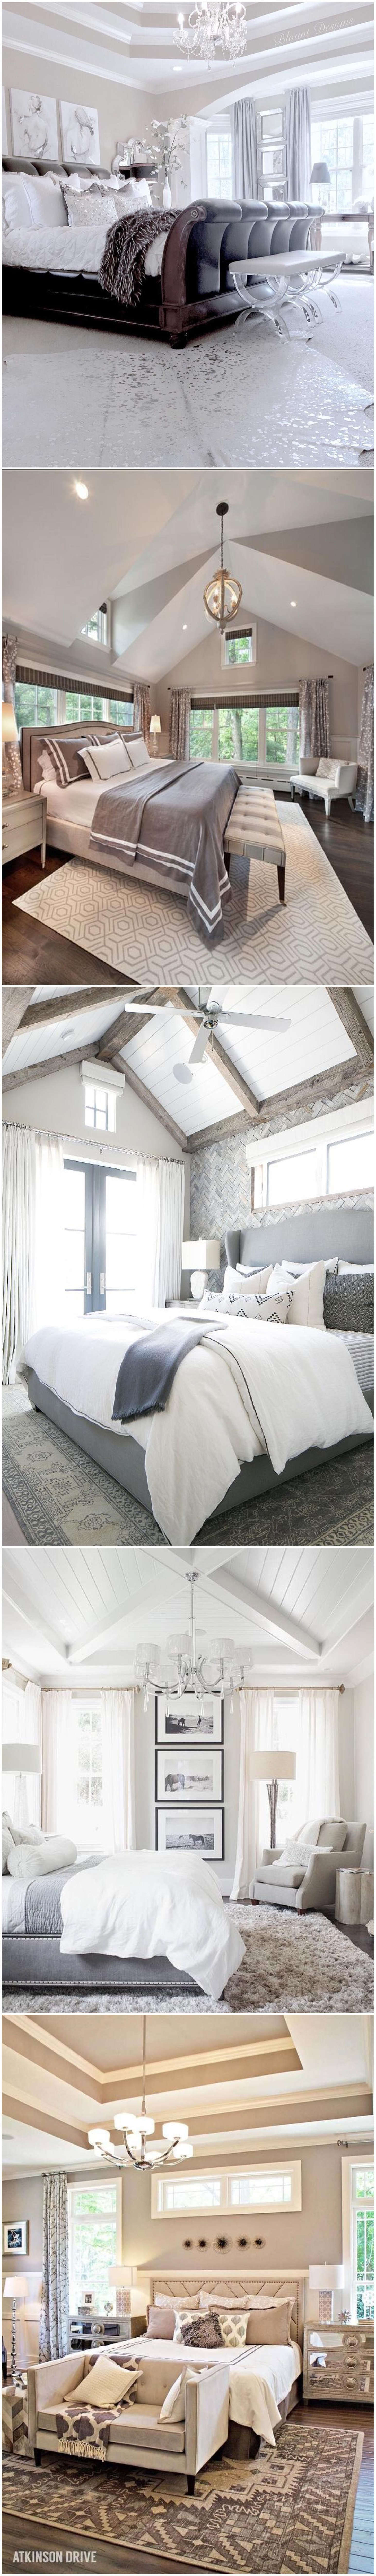 Ultra modern bedroom interior design  gorgeous u ultramodern bedroom designs  bedrooms modern and